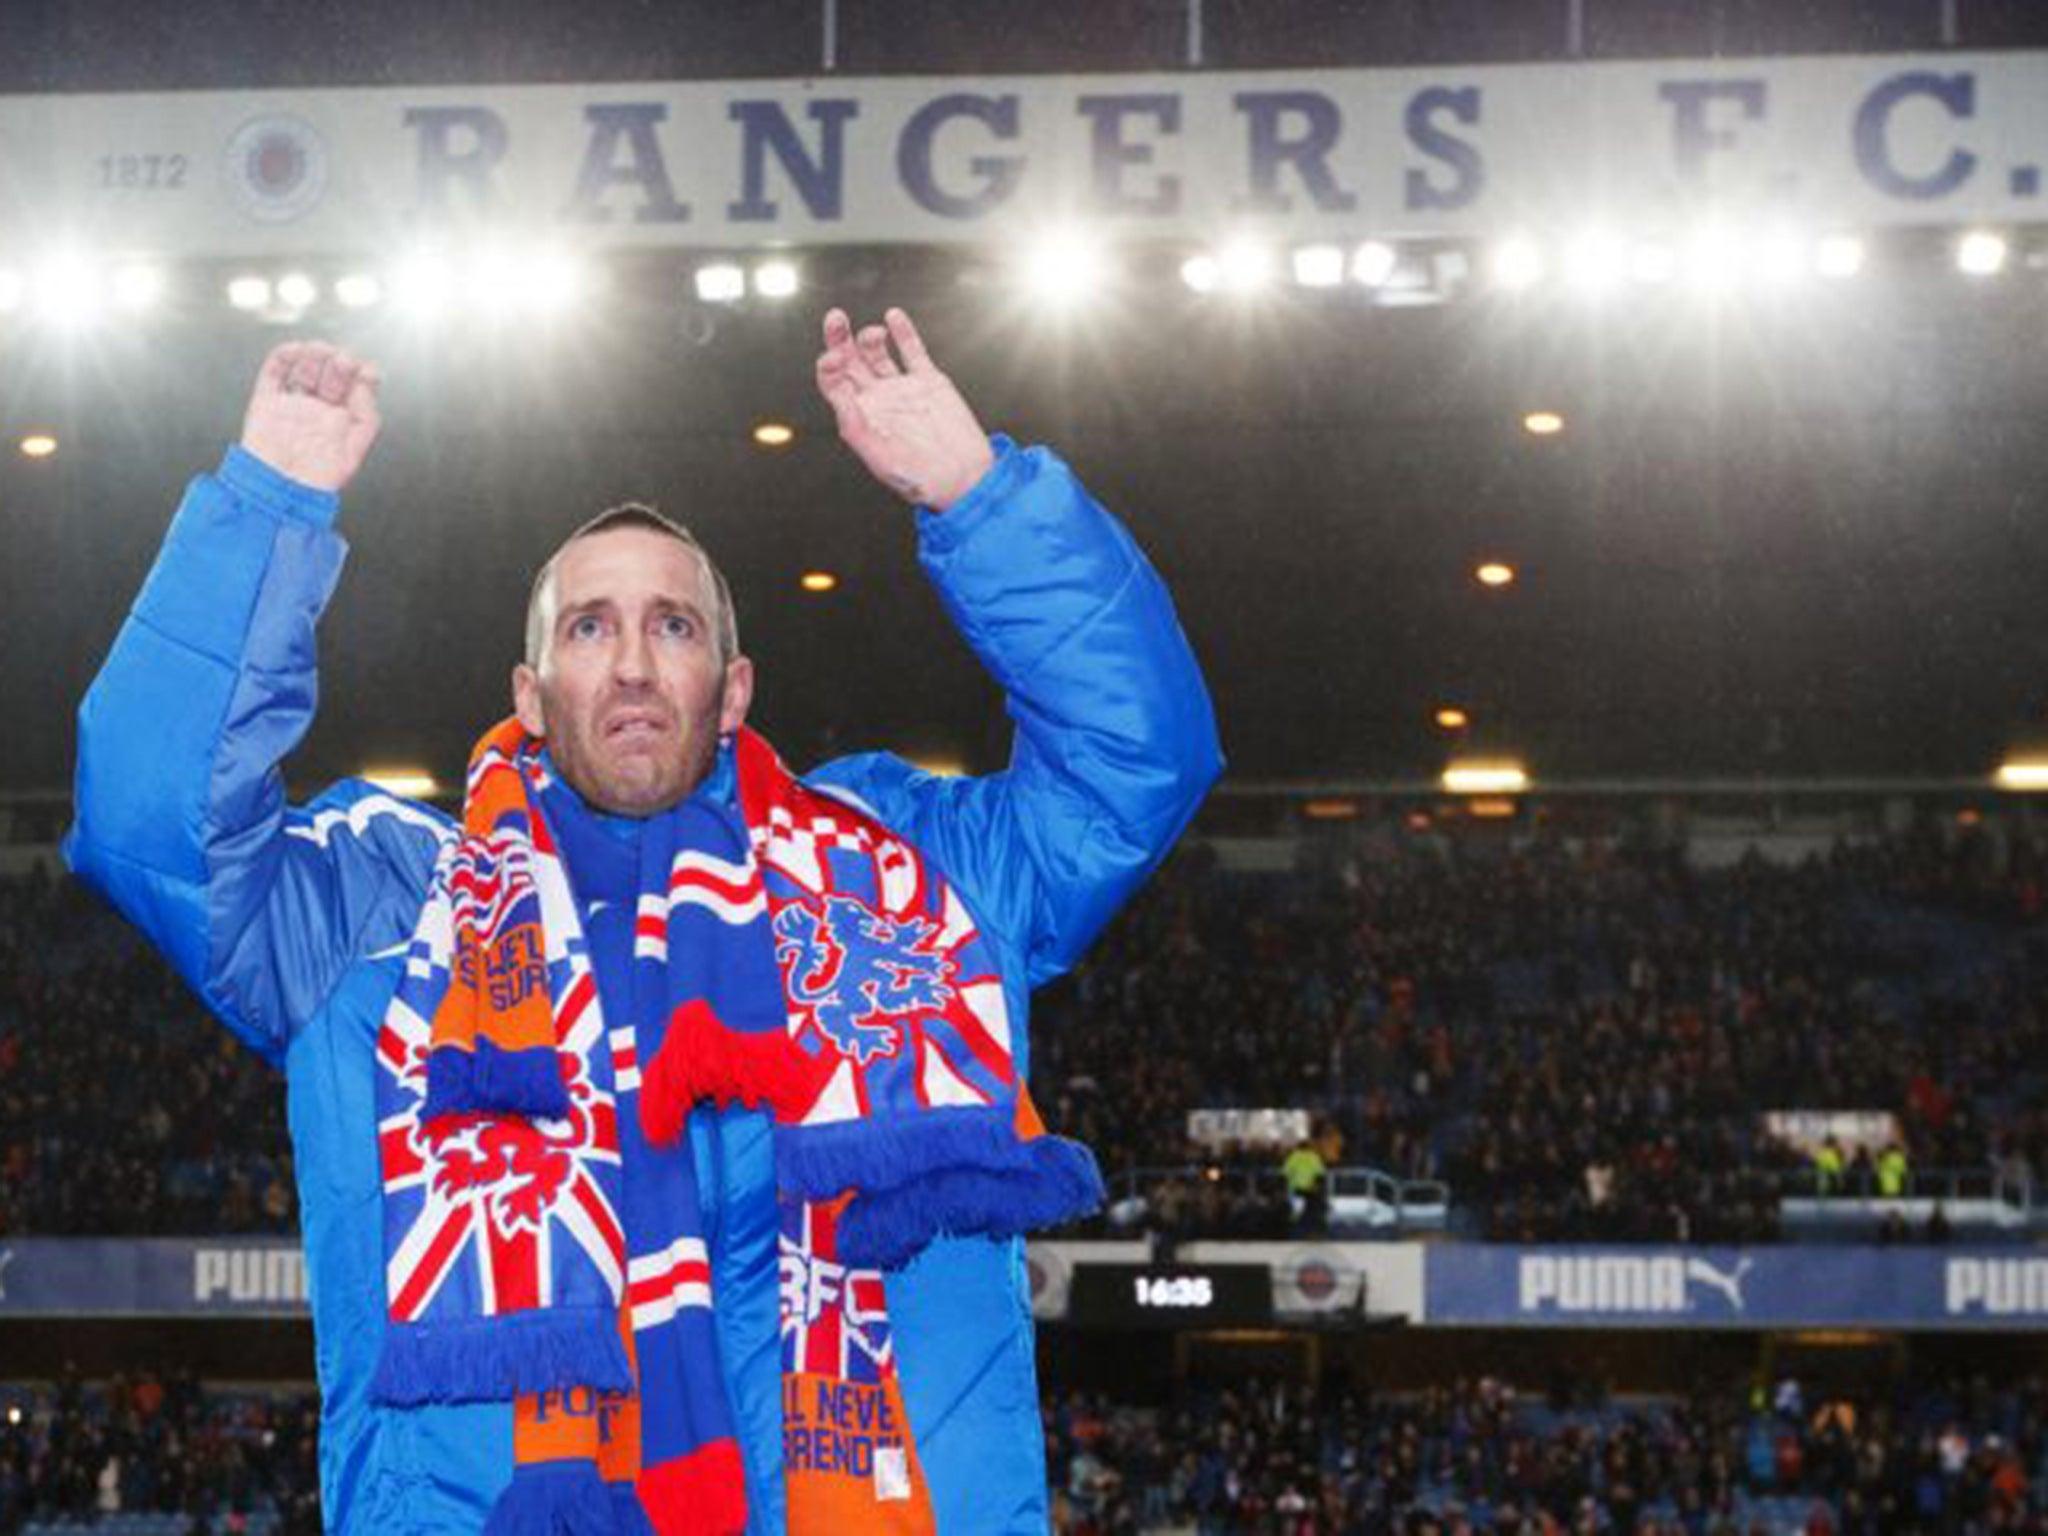 Fernando Ricksen death: Former Rangers footballer dies, aged 43 after battle with motor neurone disease